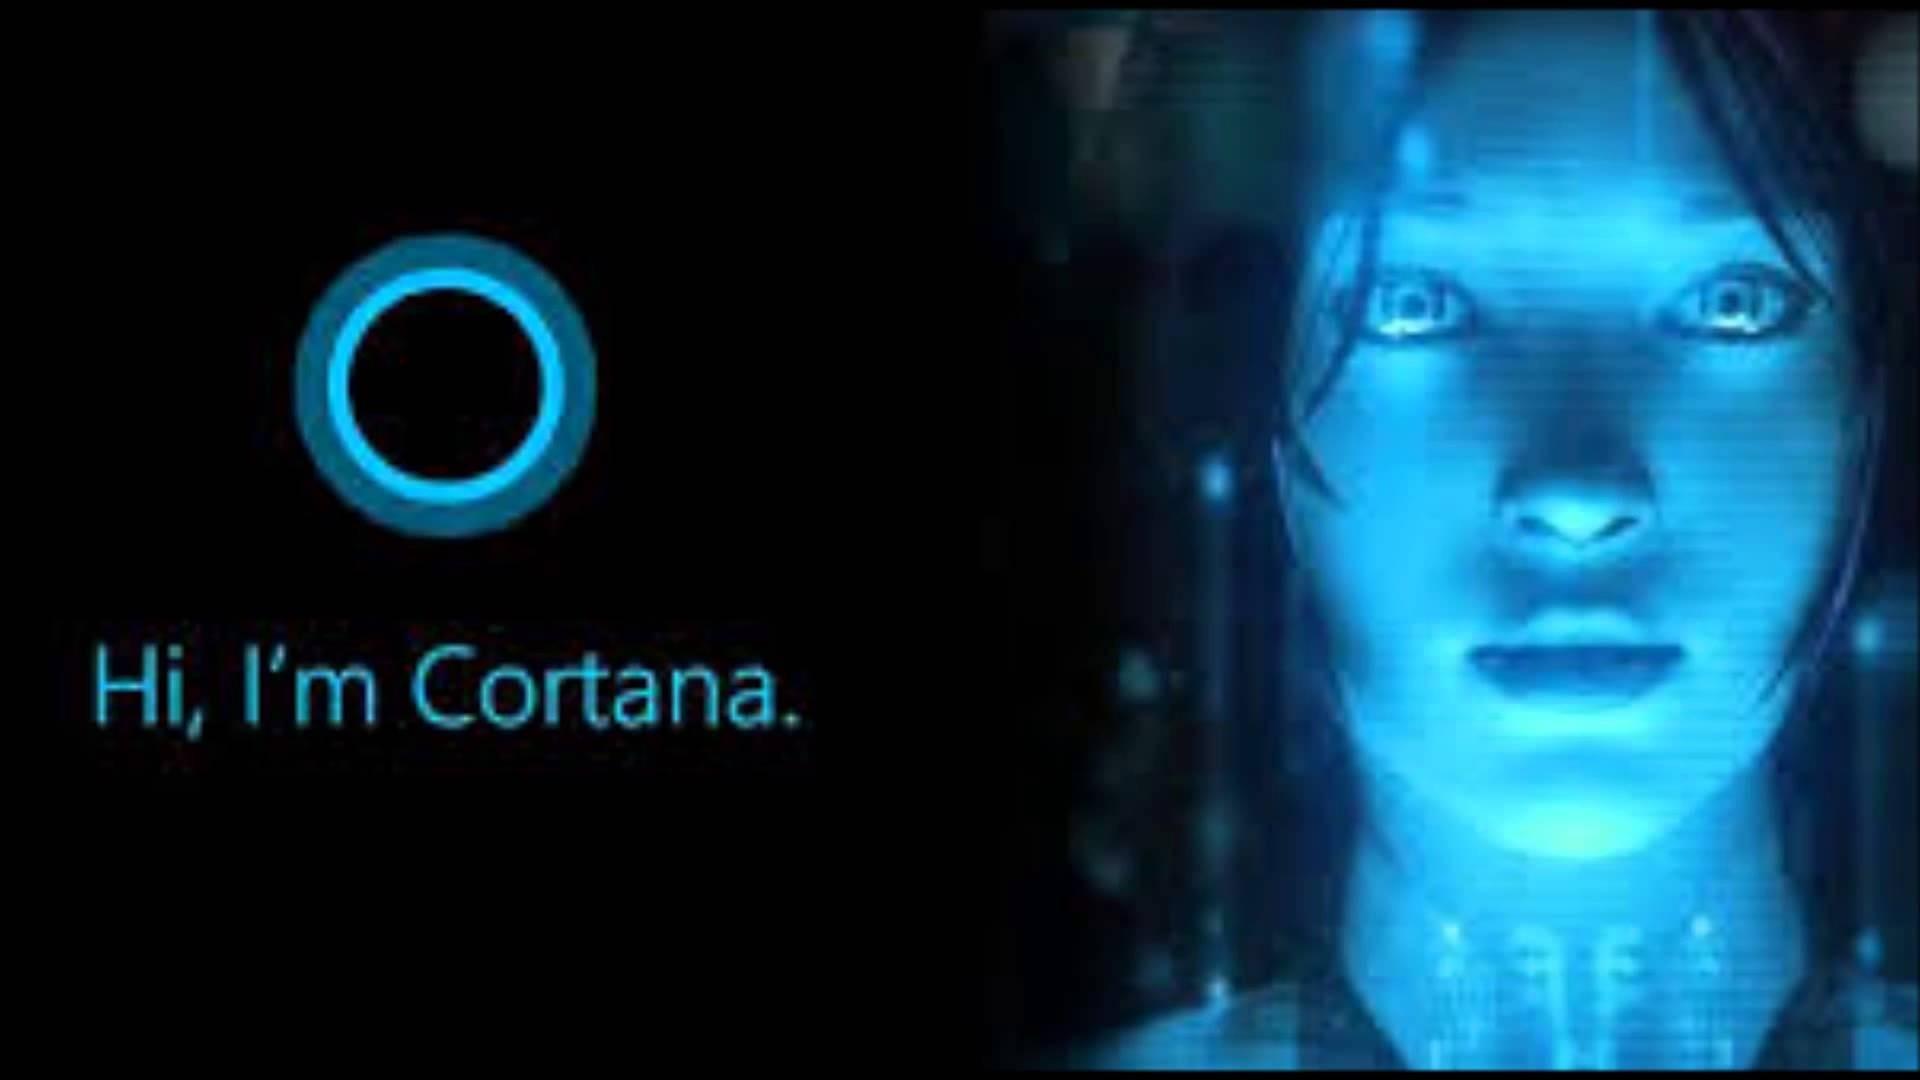 70 Cortana Wallpapers on WallpaperPlay 1920x1080